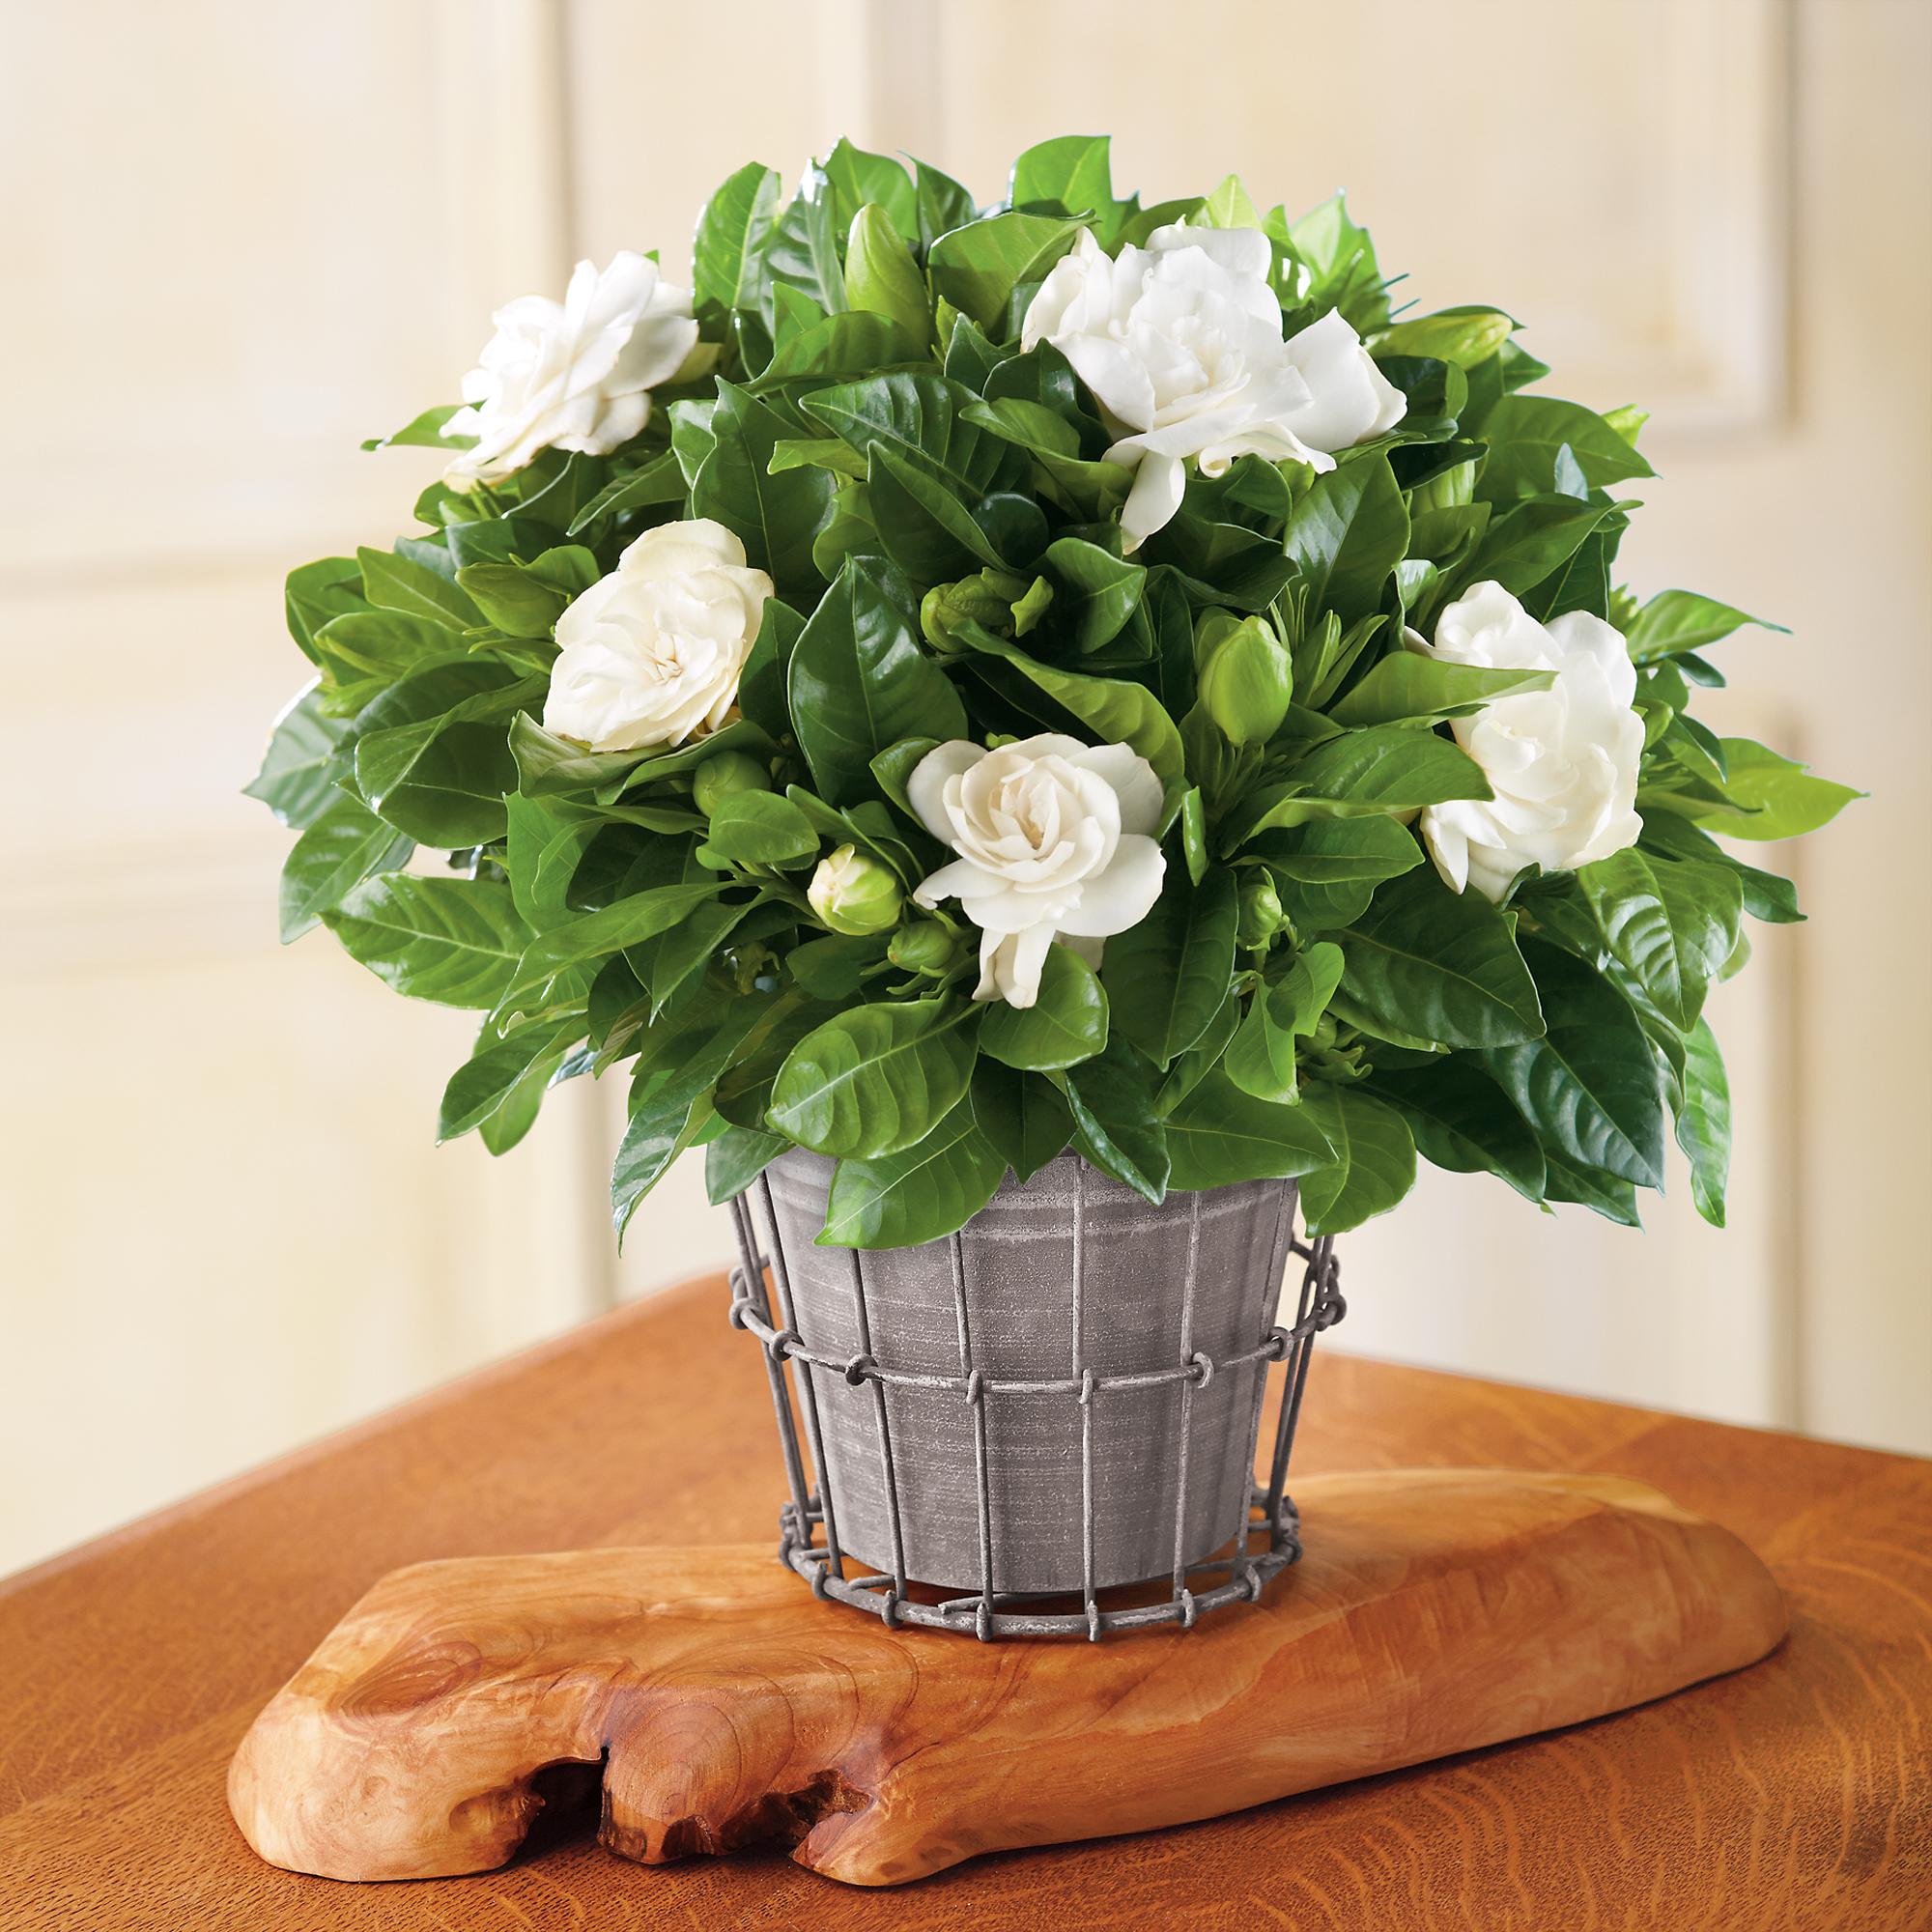 New 4 gardenia plant gift